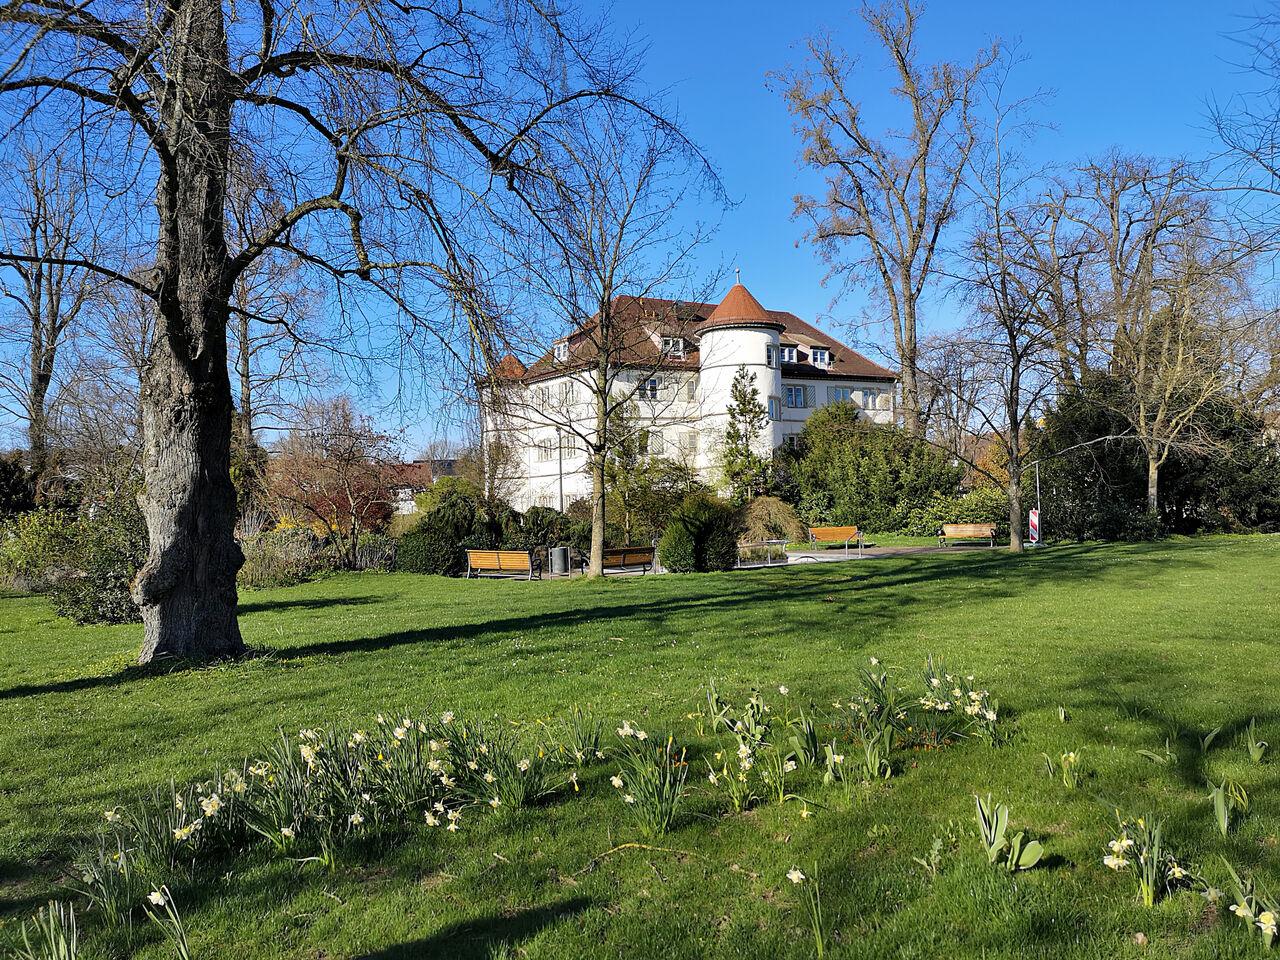 20200322_Schlosspark_in_Bad_Rappenau_002